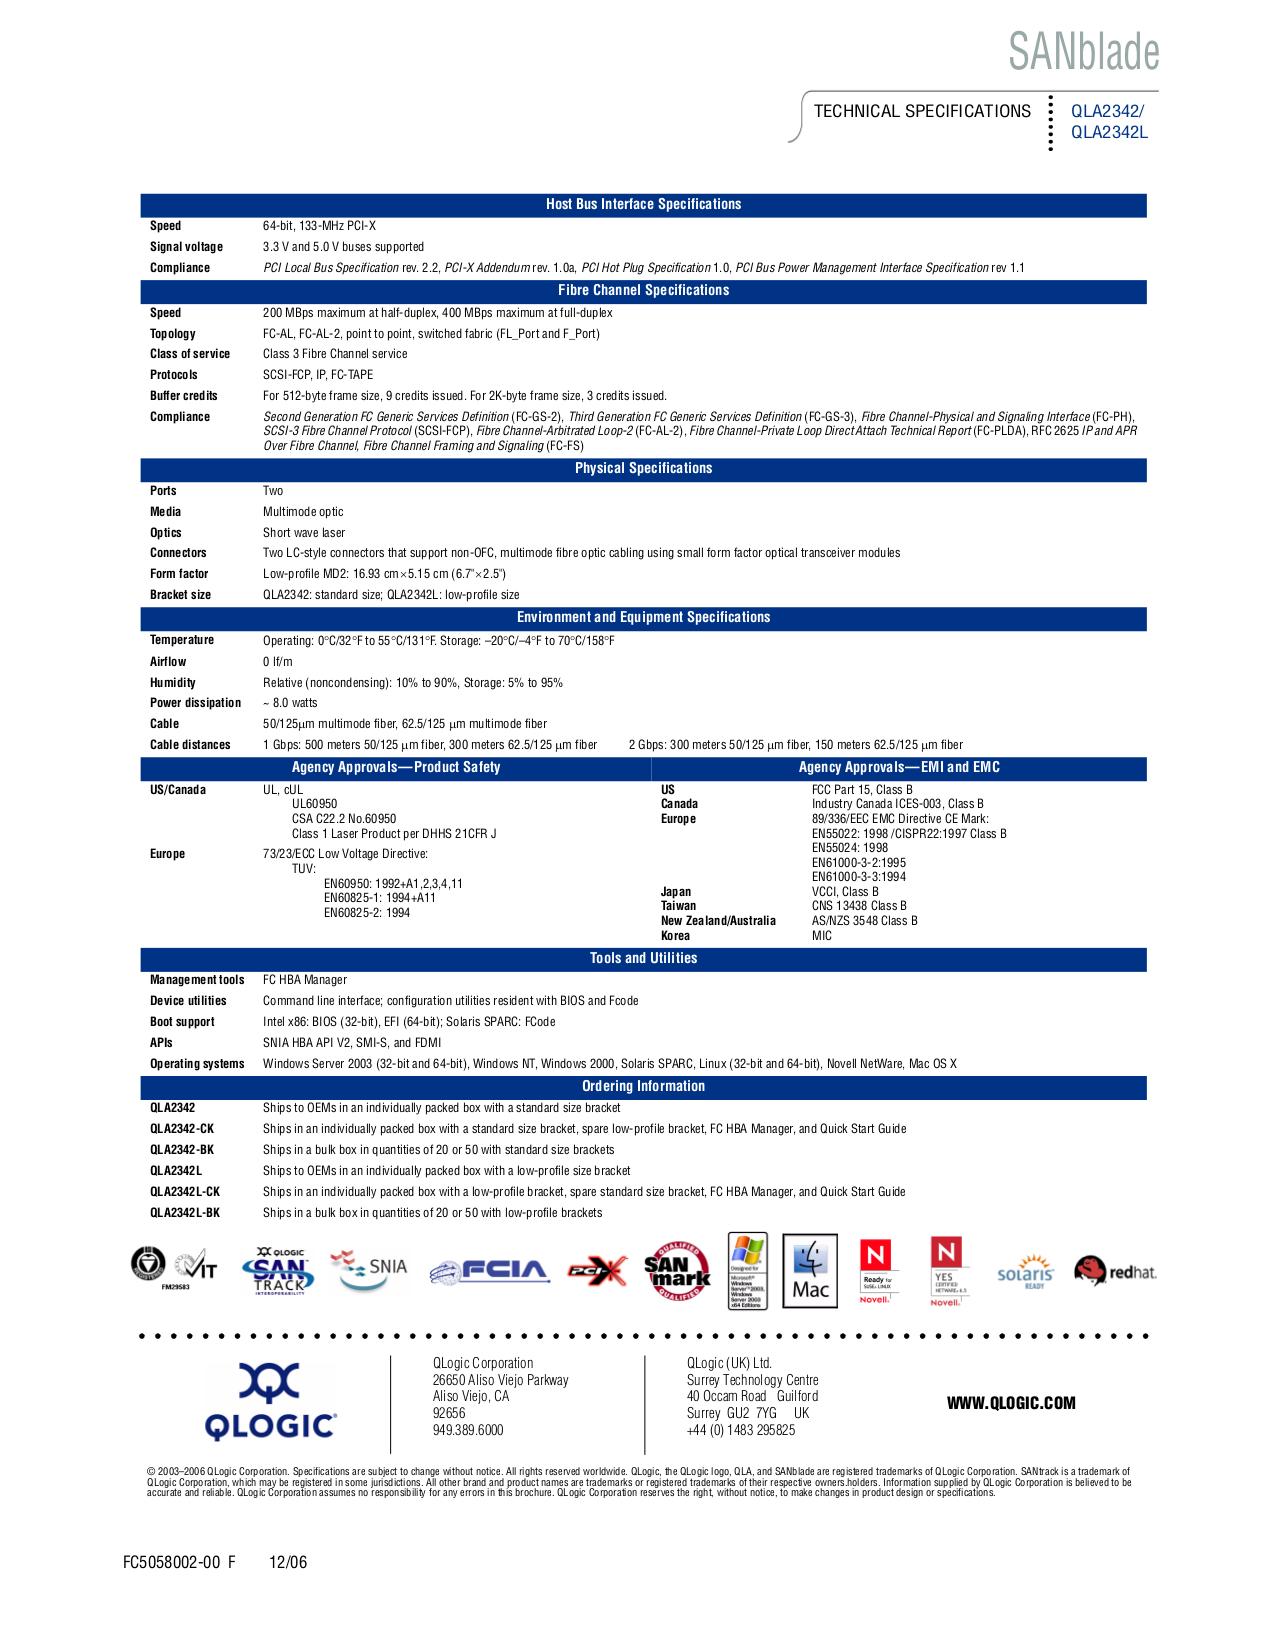 DELL POWEREDGE R730 TECHNICAL MANUAL Pdf Download